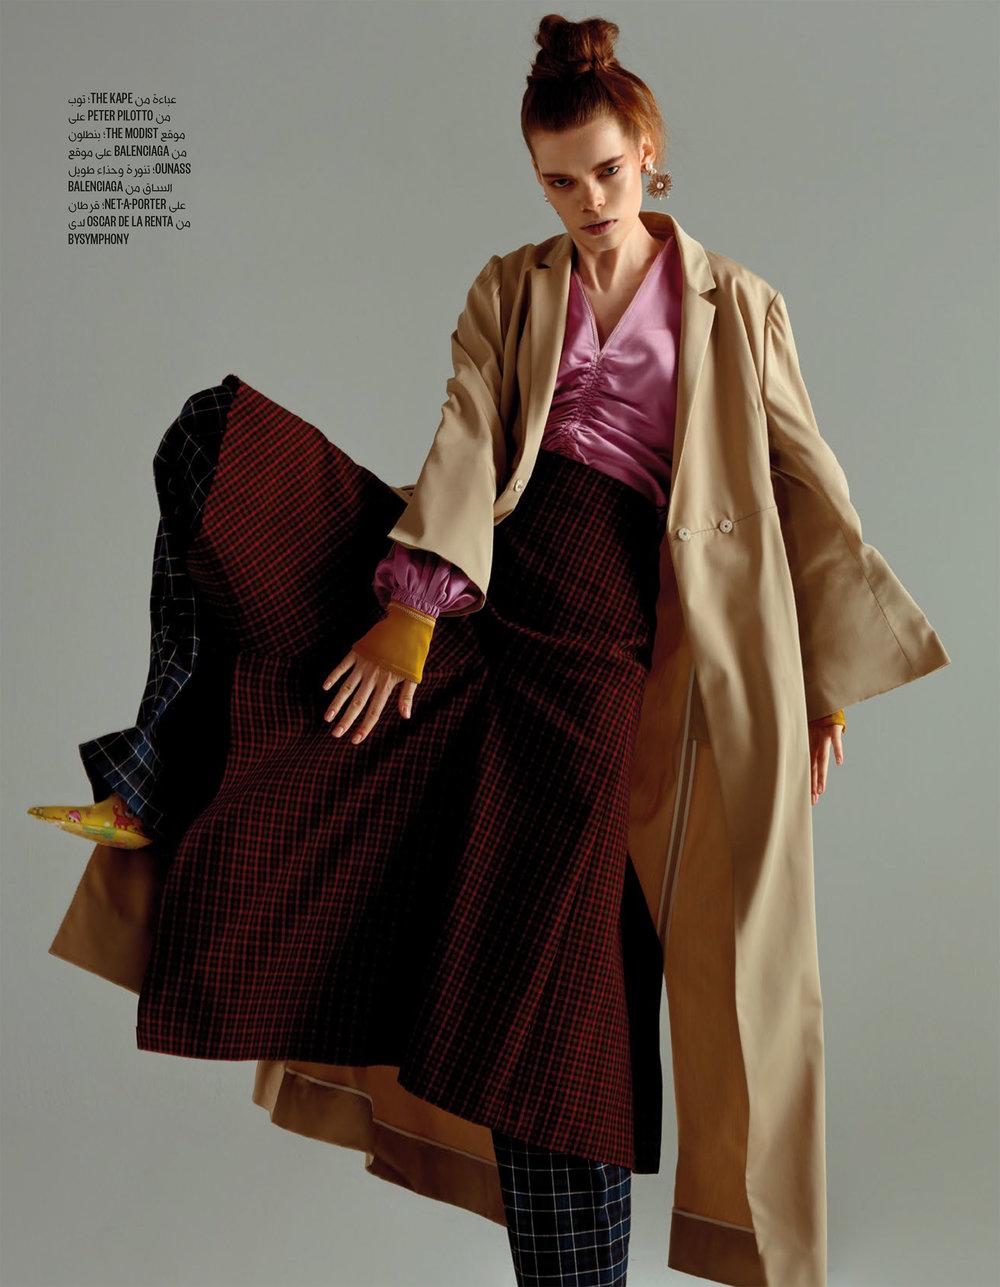 Vogue October Binder_Magzter (dragged)-2.jpg